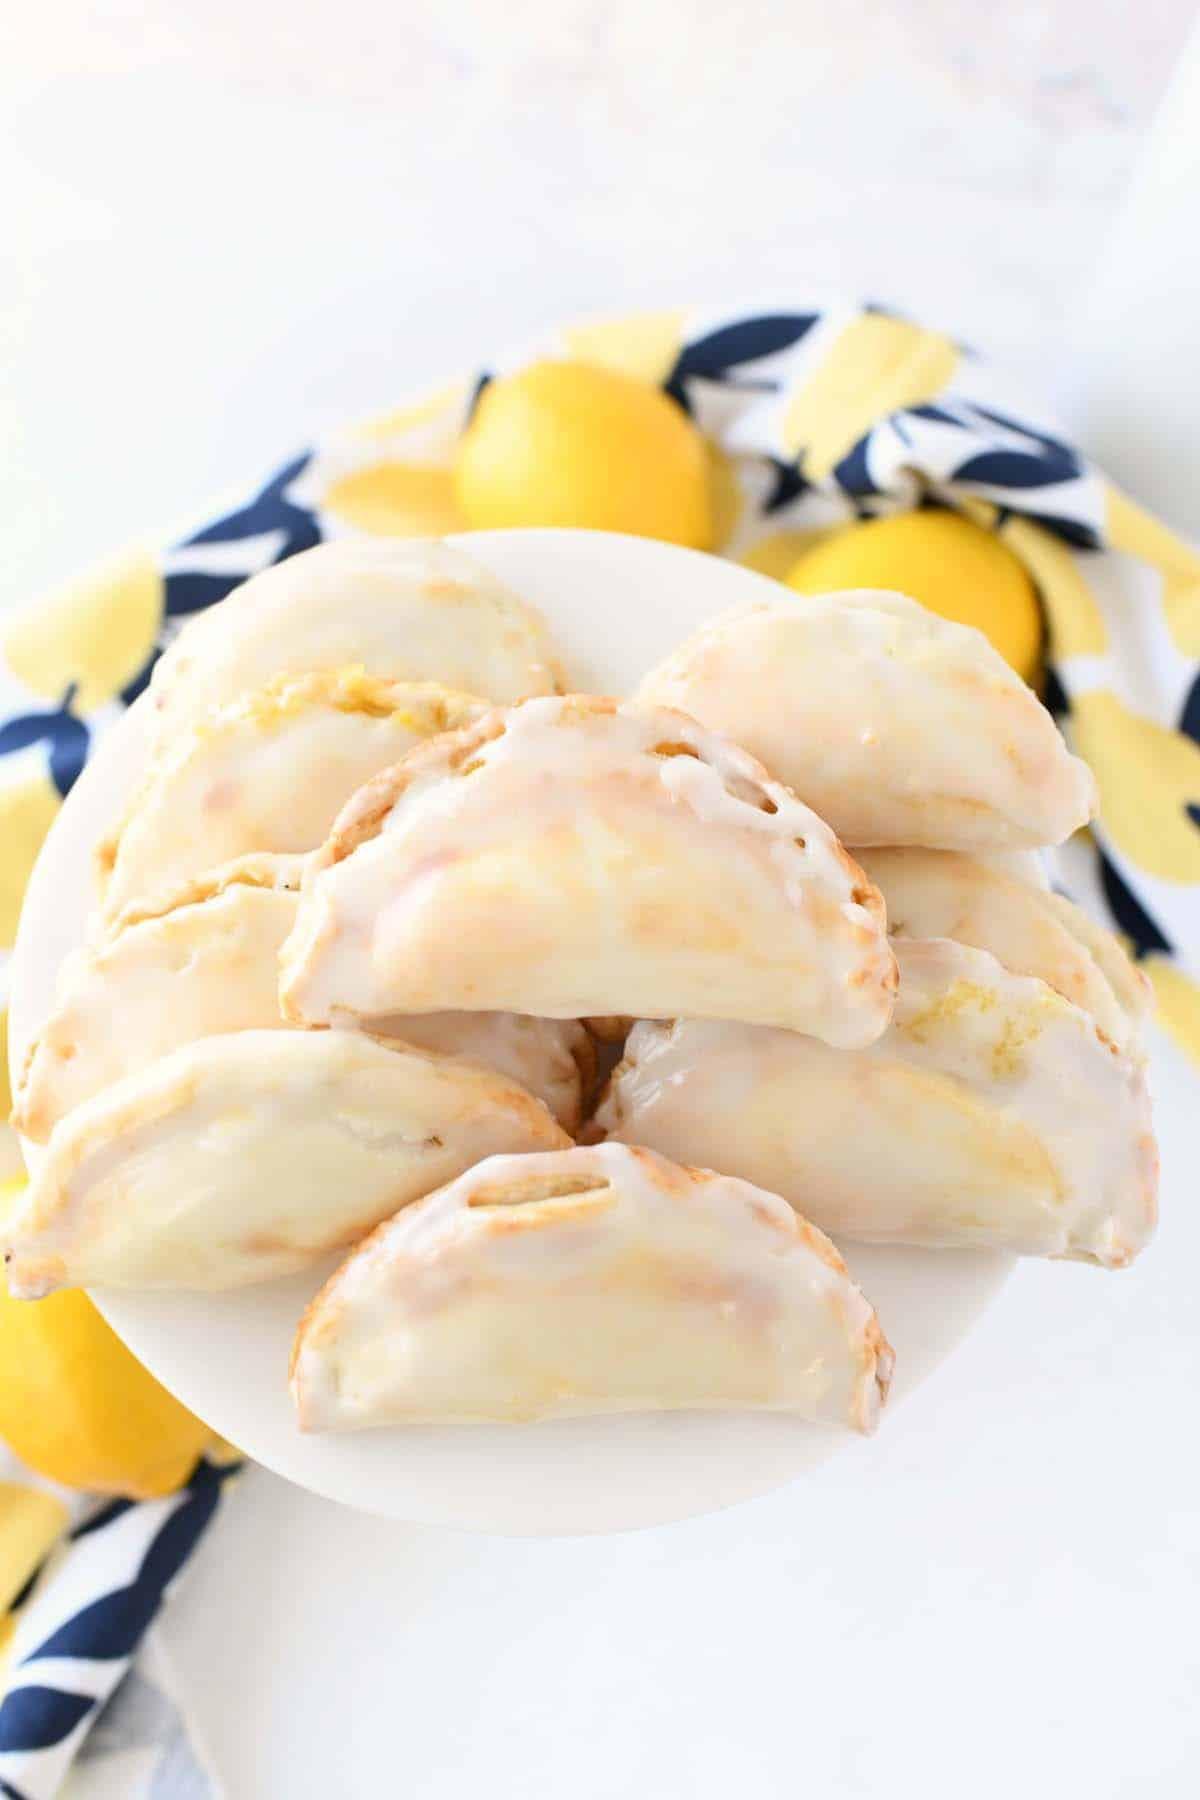 Lemon Hand Pies on a white plate with a lemon themed napkin.